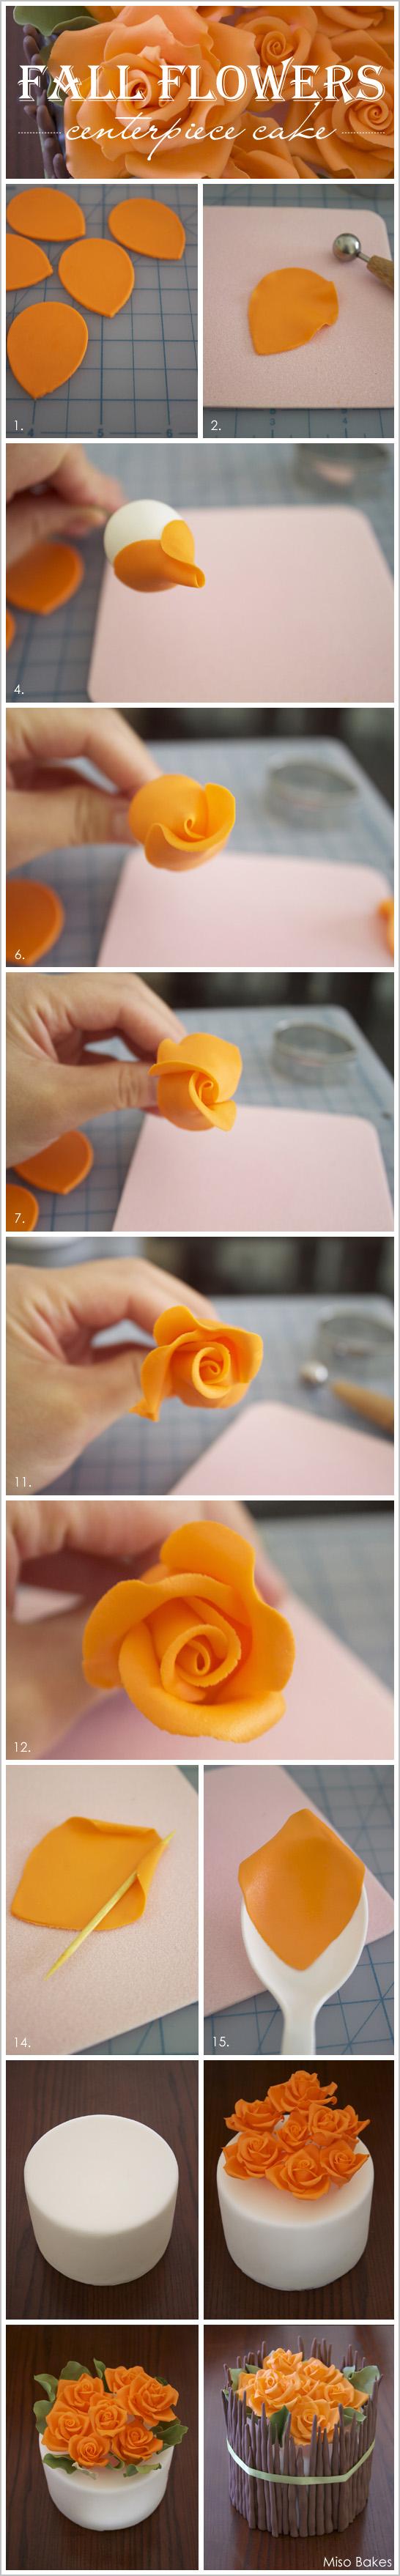 DIY Fall Flowers Centerpiece Cake